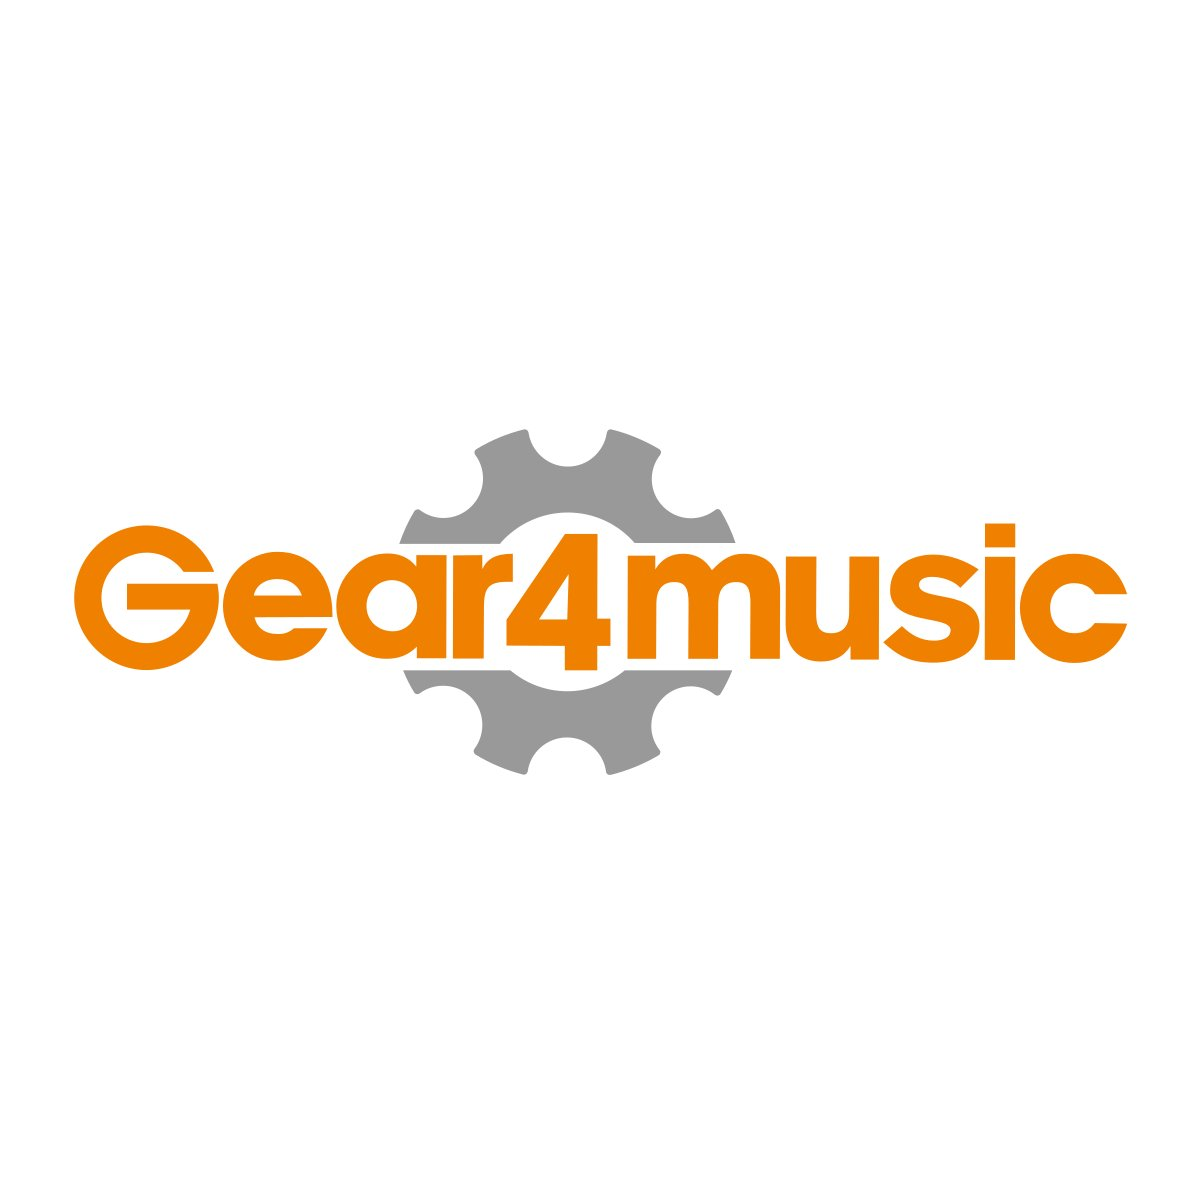 HP170 Headphones by Gear4music